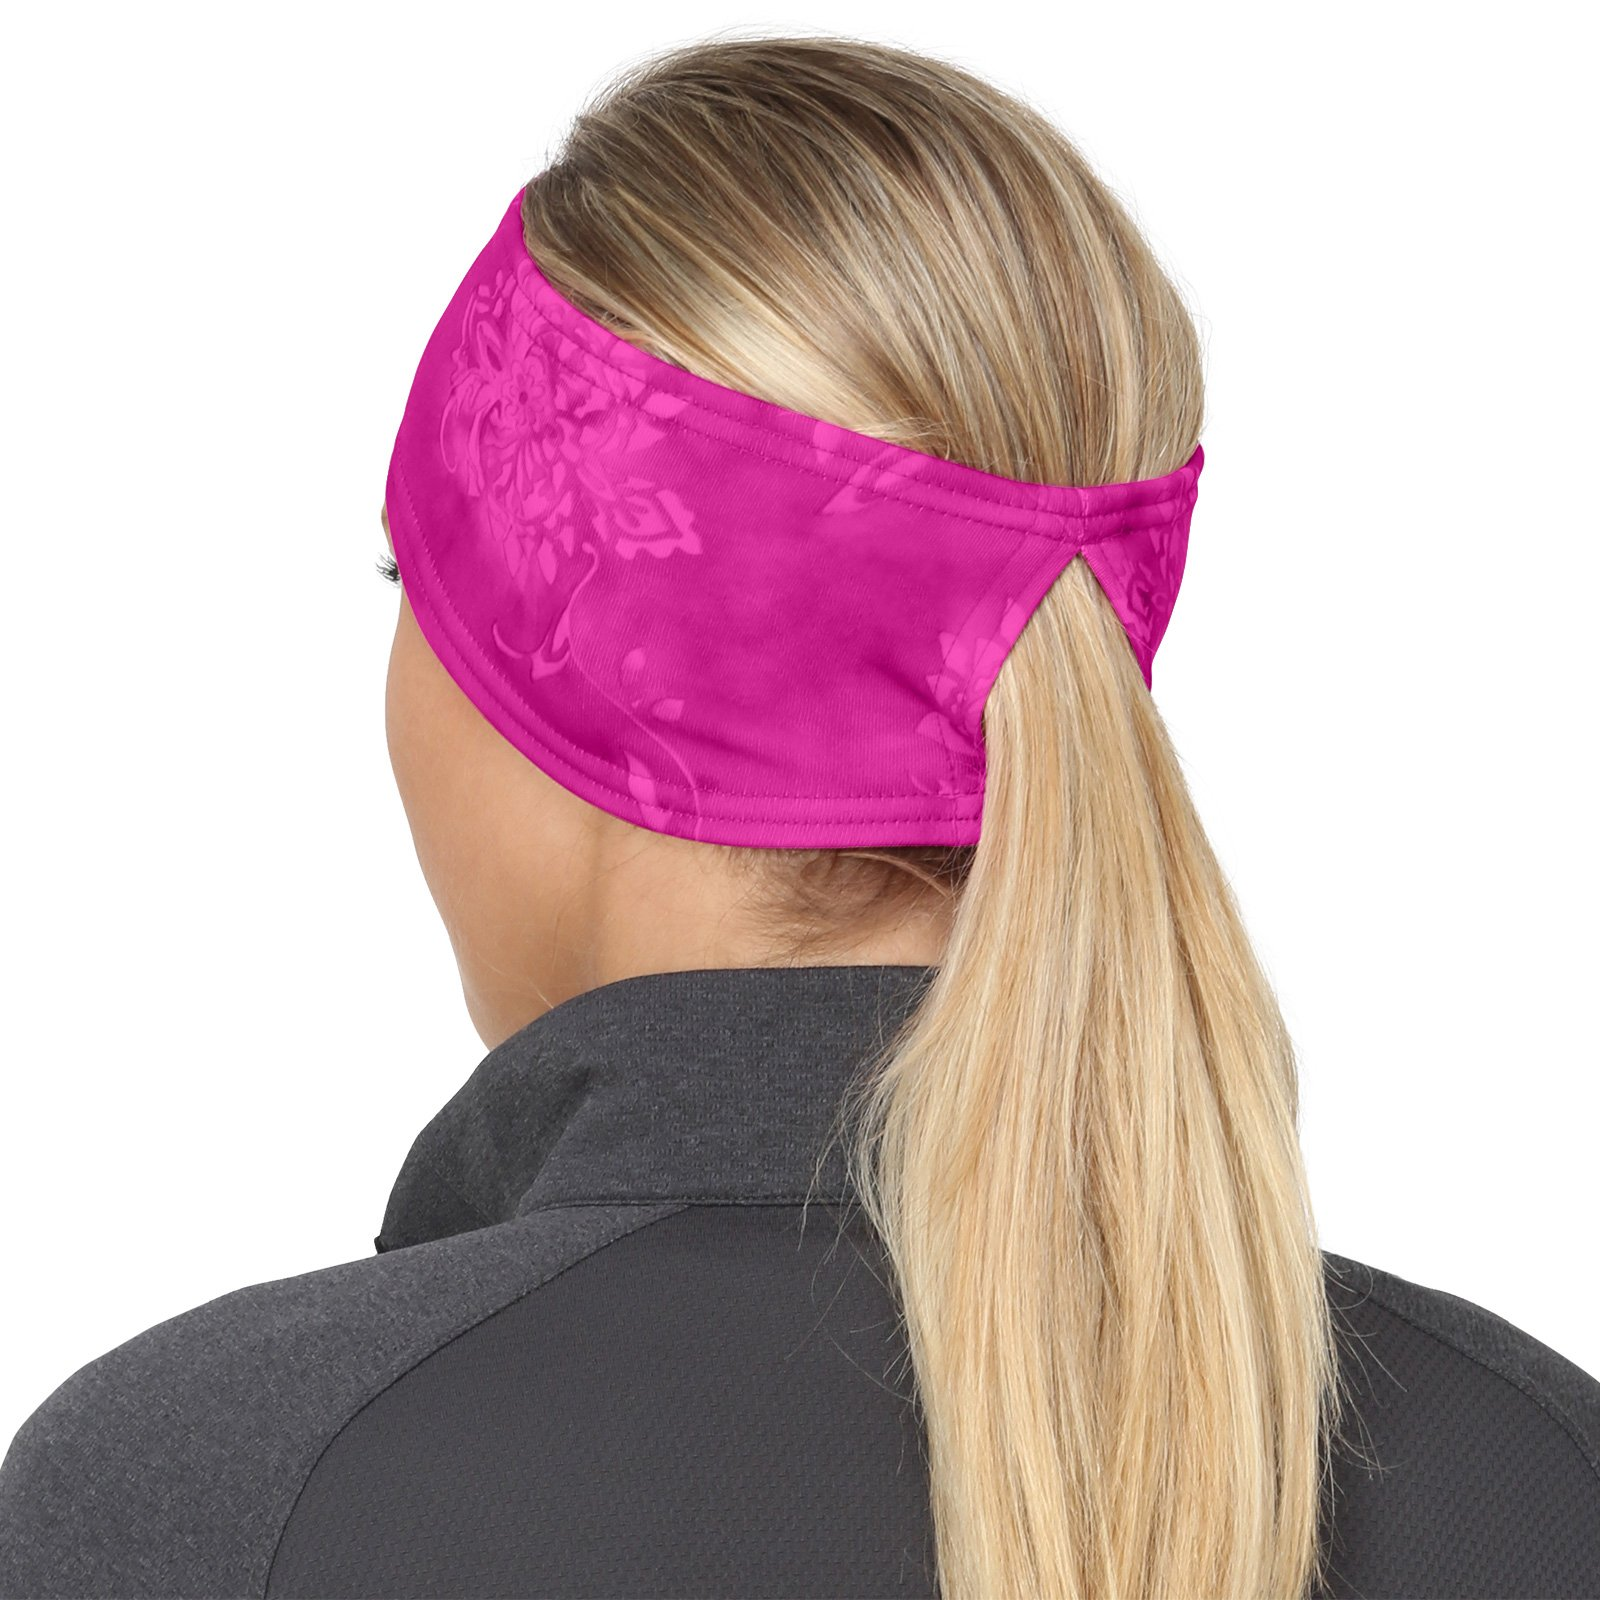 TrailHeads Women's Print Ponytail Headband – 12 prints - Made in USA - pink splash by TrailHeads (Image #5)